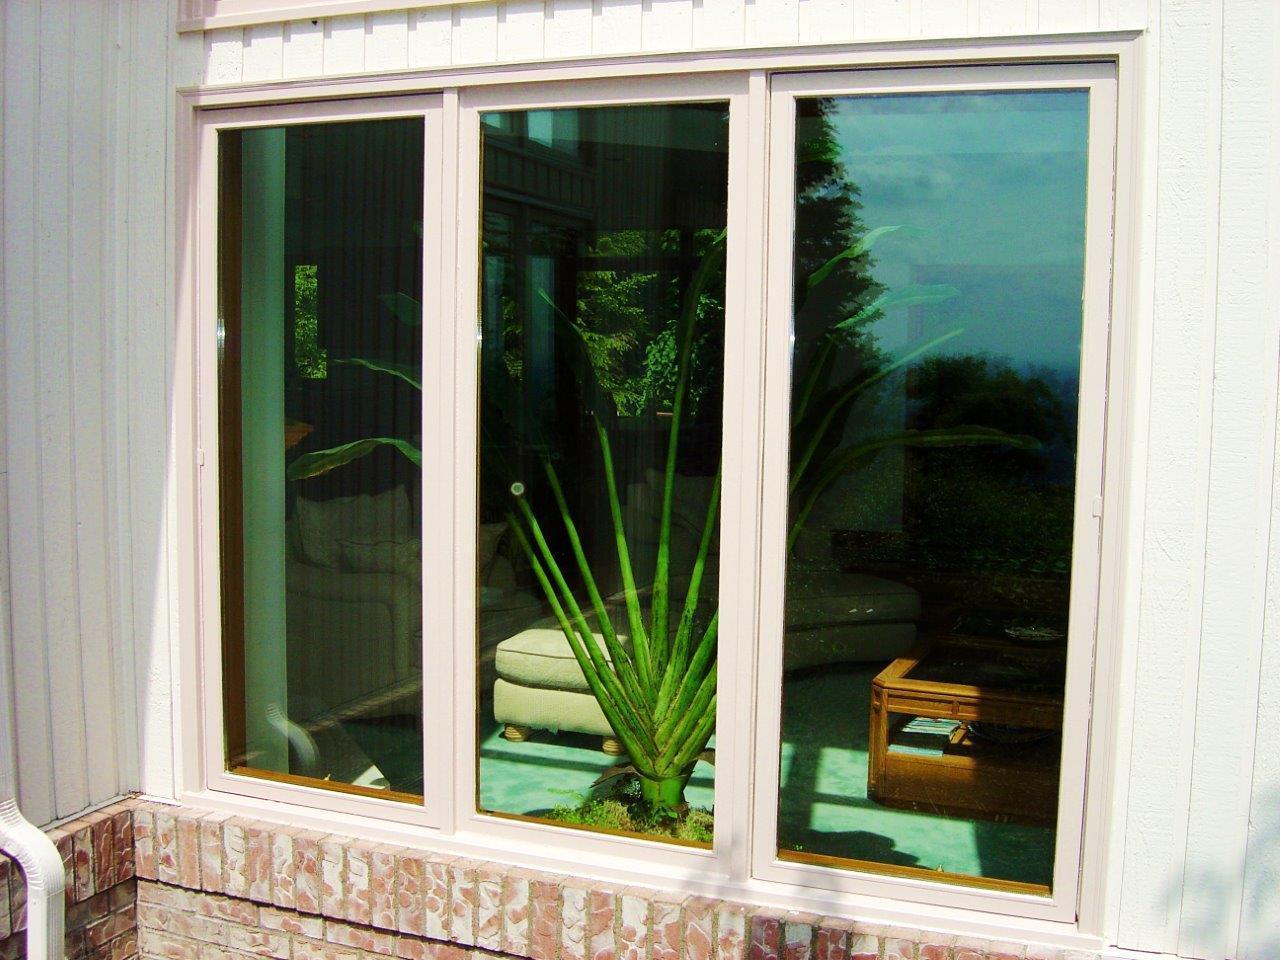 window company installs new replacement windows in Seattle, WA